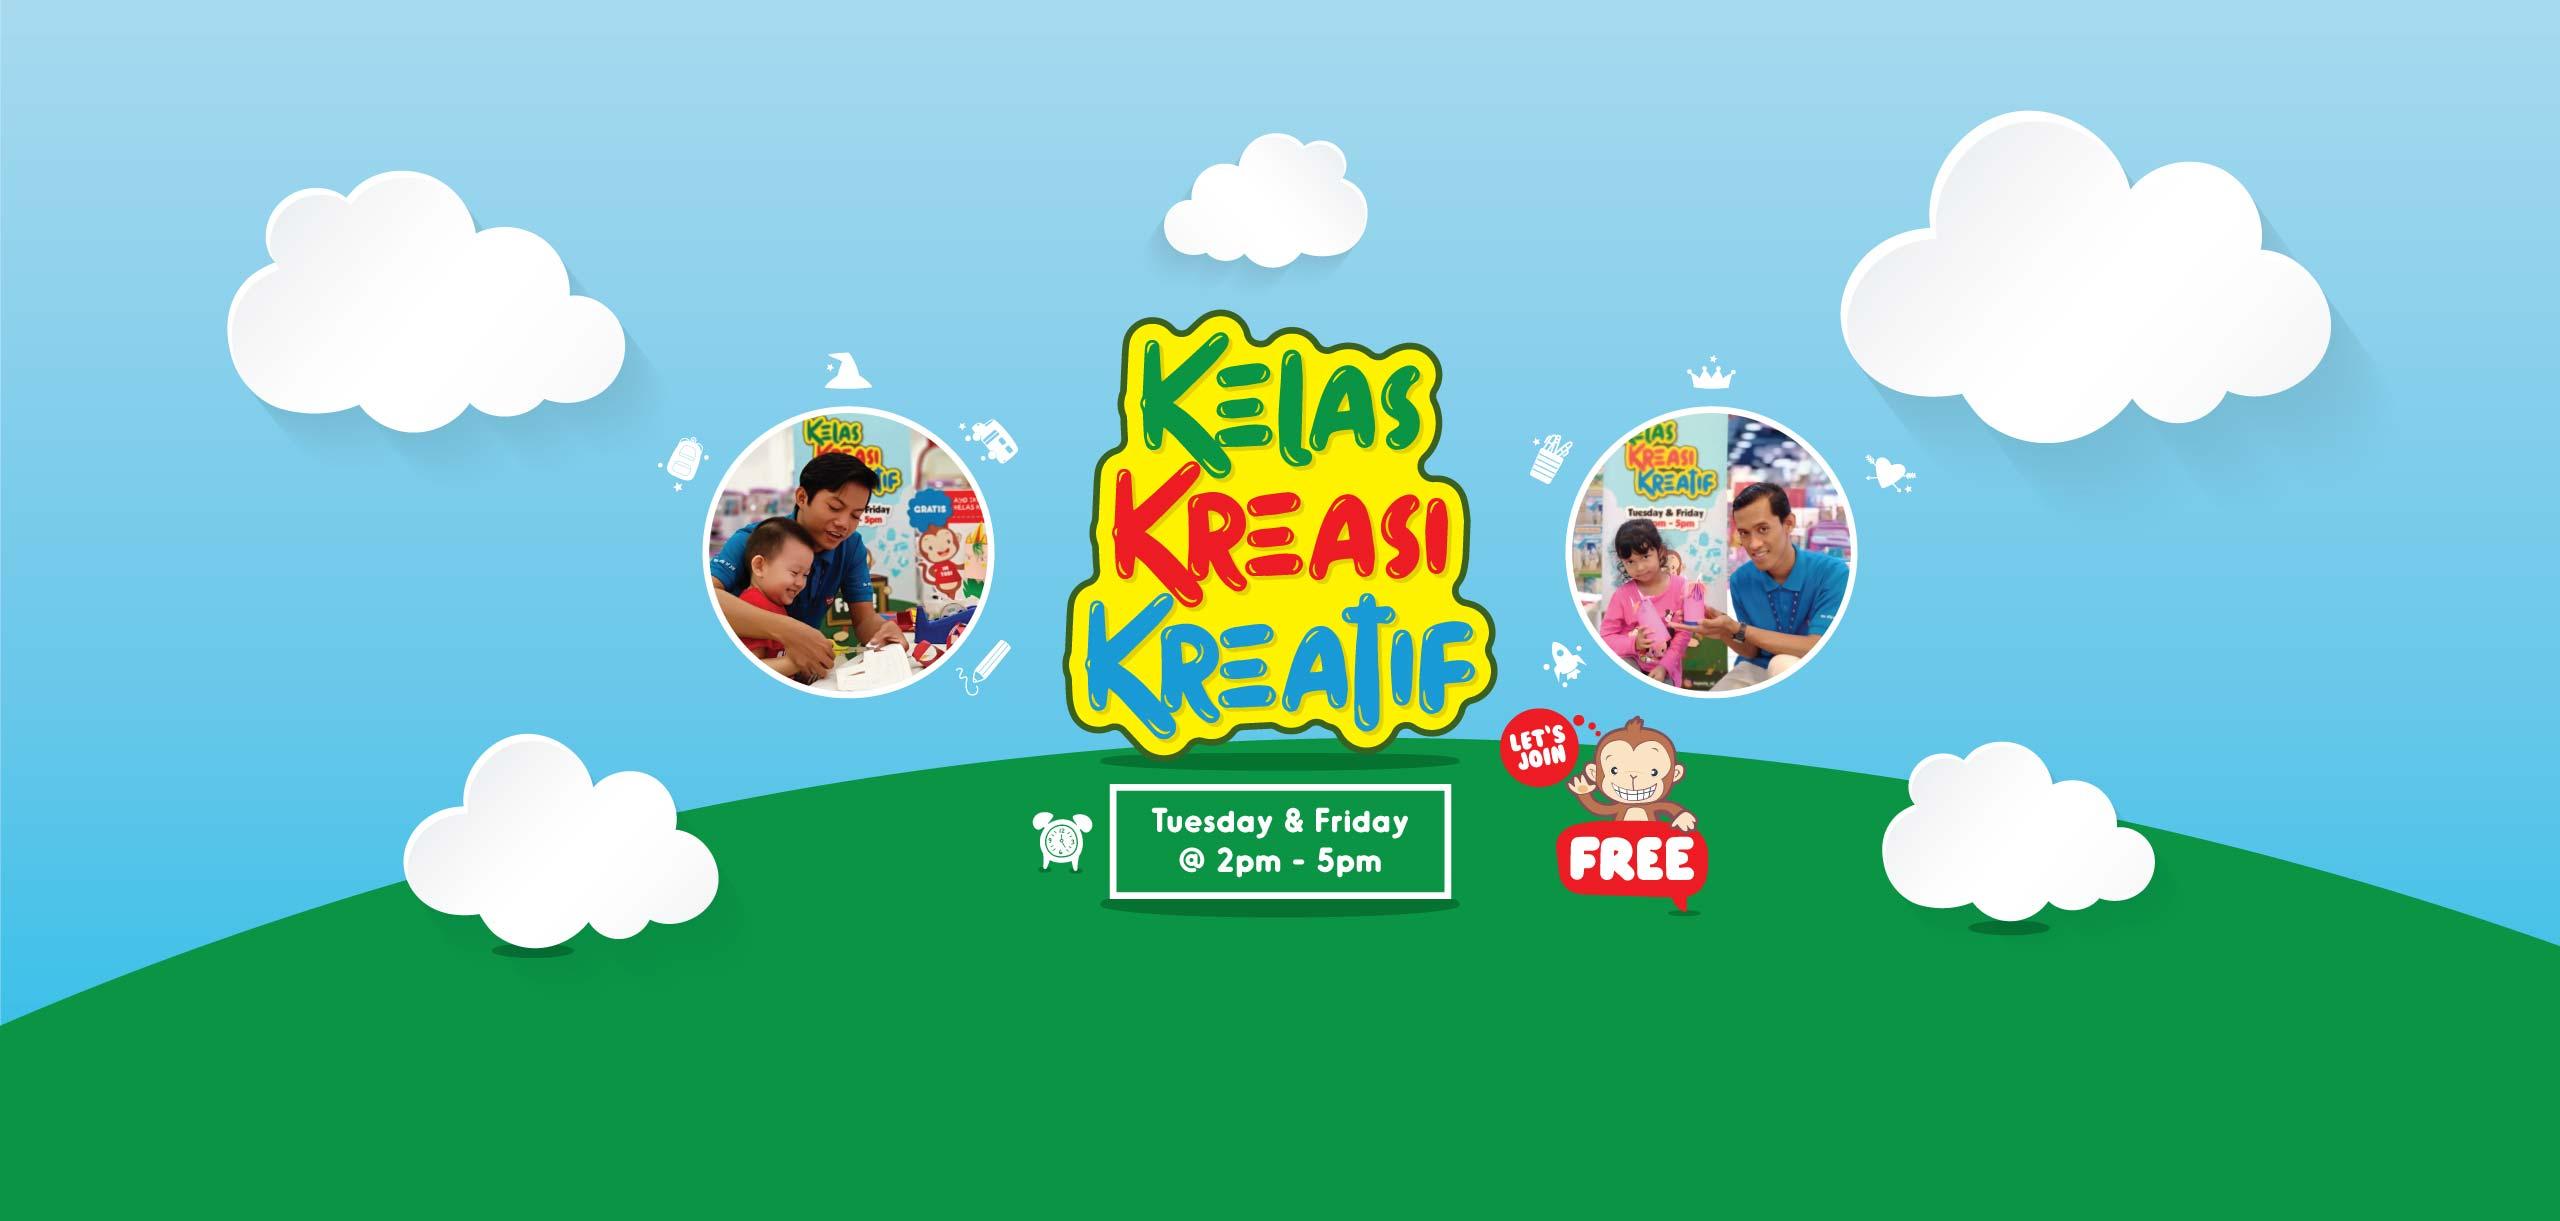 Toyscity Kelas Kreasi Kreatif every Tuesday & Friday 2pm - 5pm